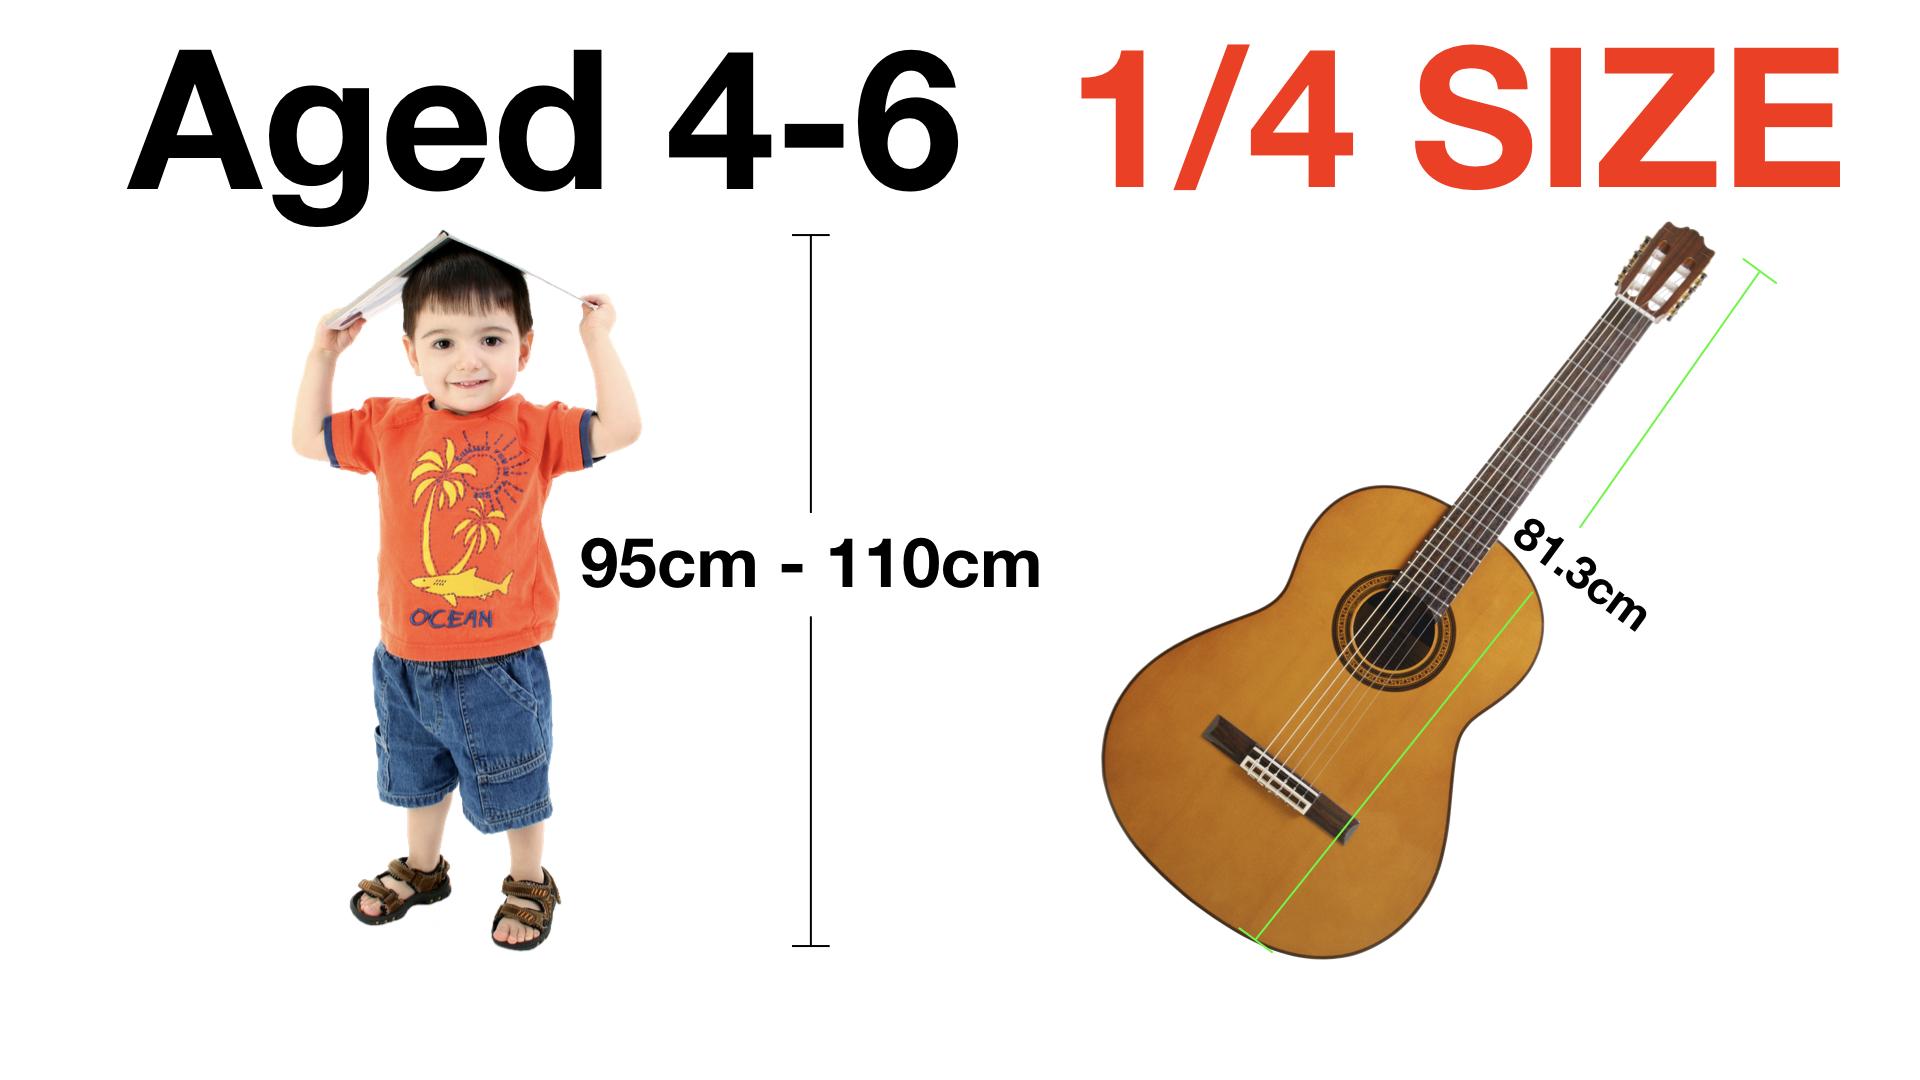 Adrian Curran Starter Guitar Aged 4-6